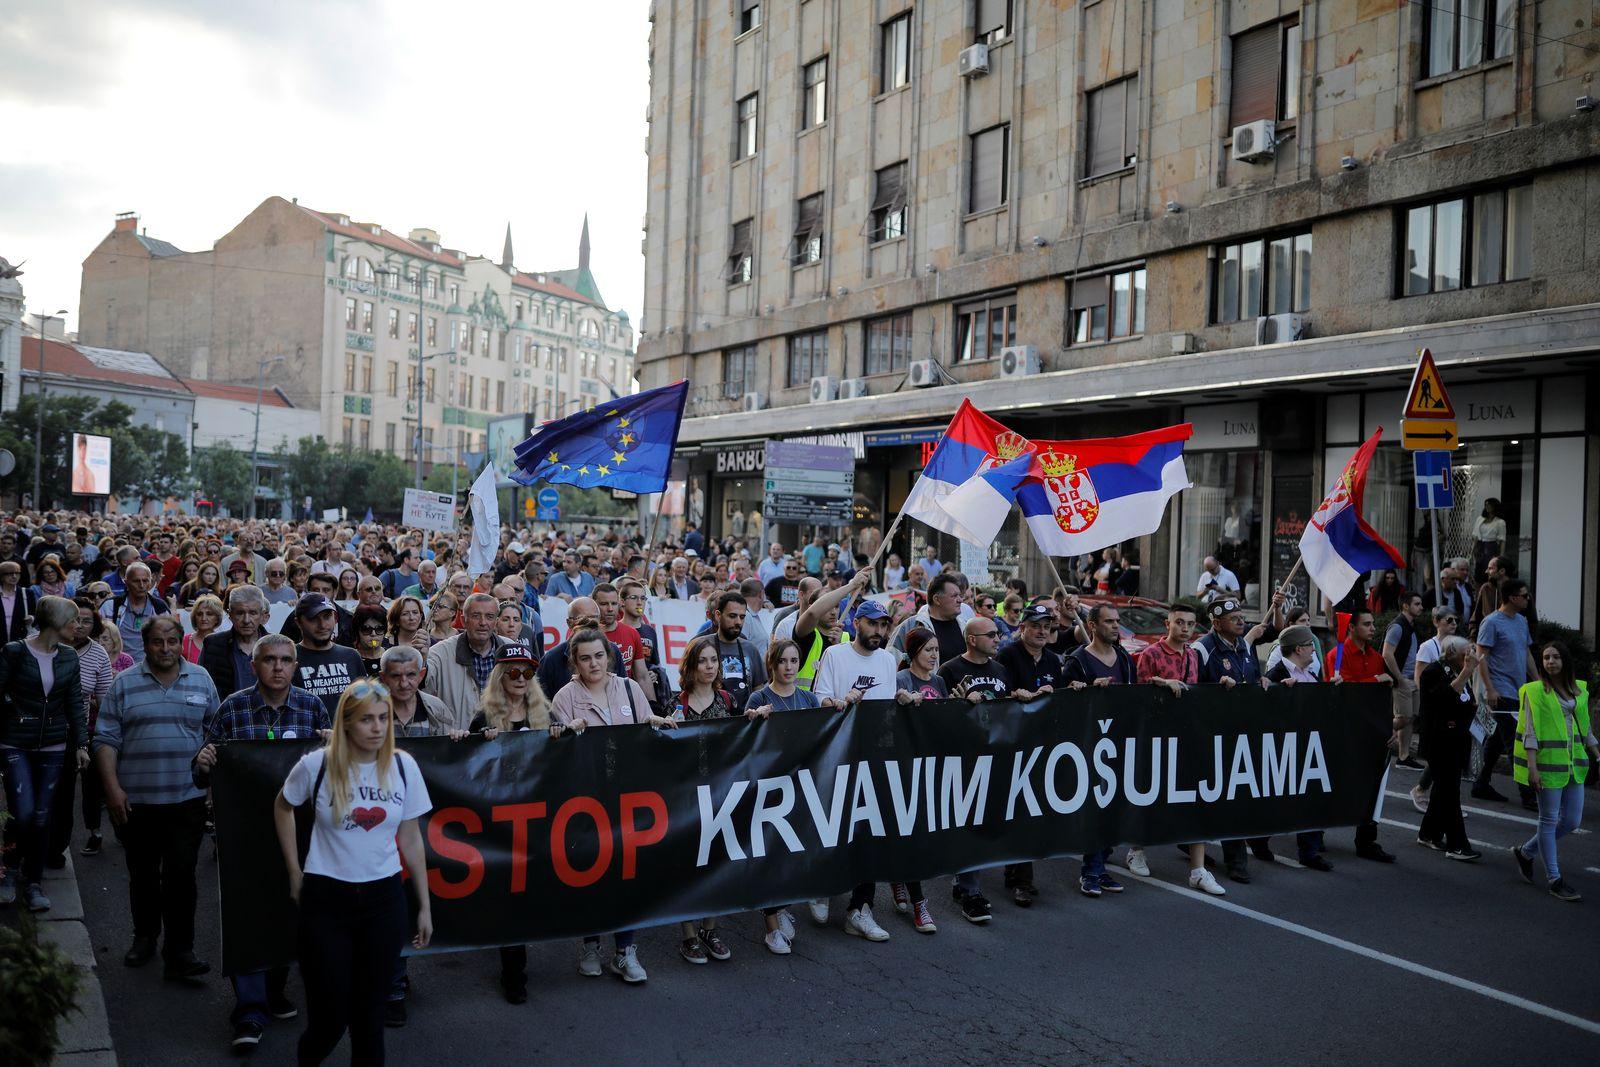 Serbien/ Proteste/ Demonstrationen/ 2019